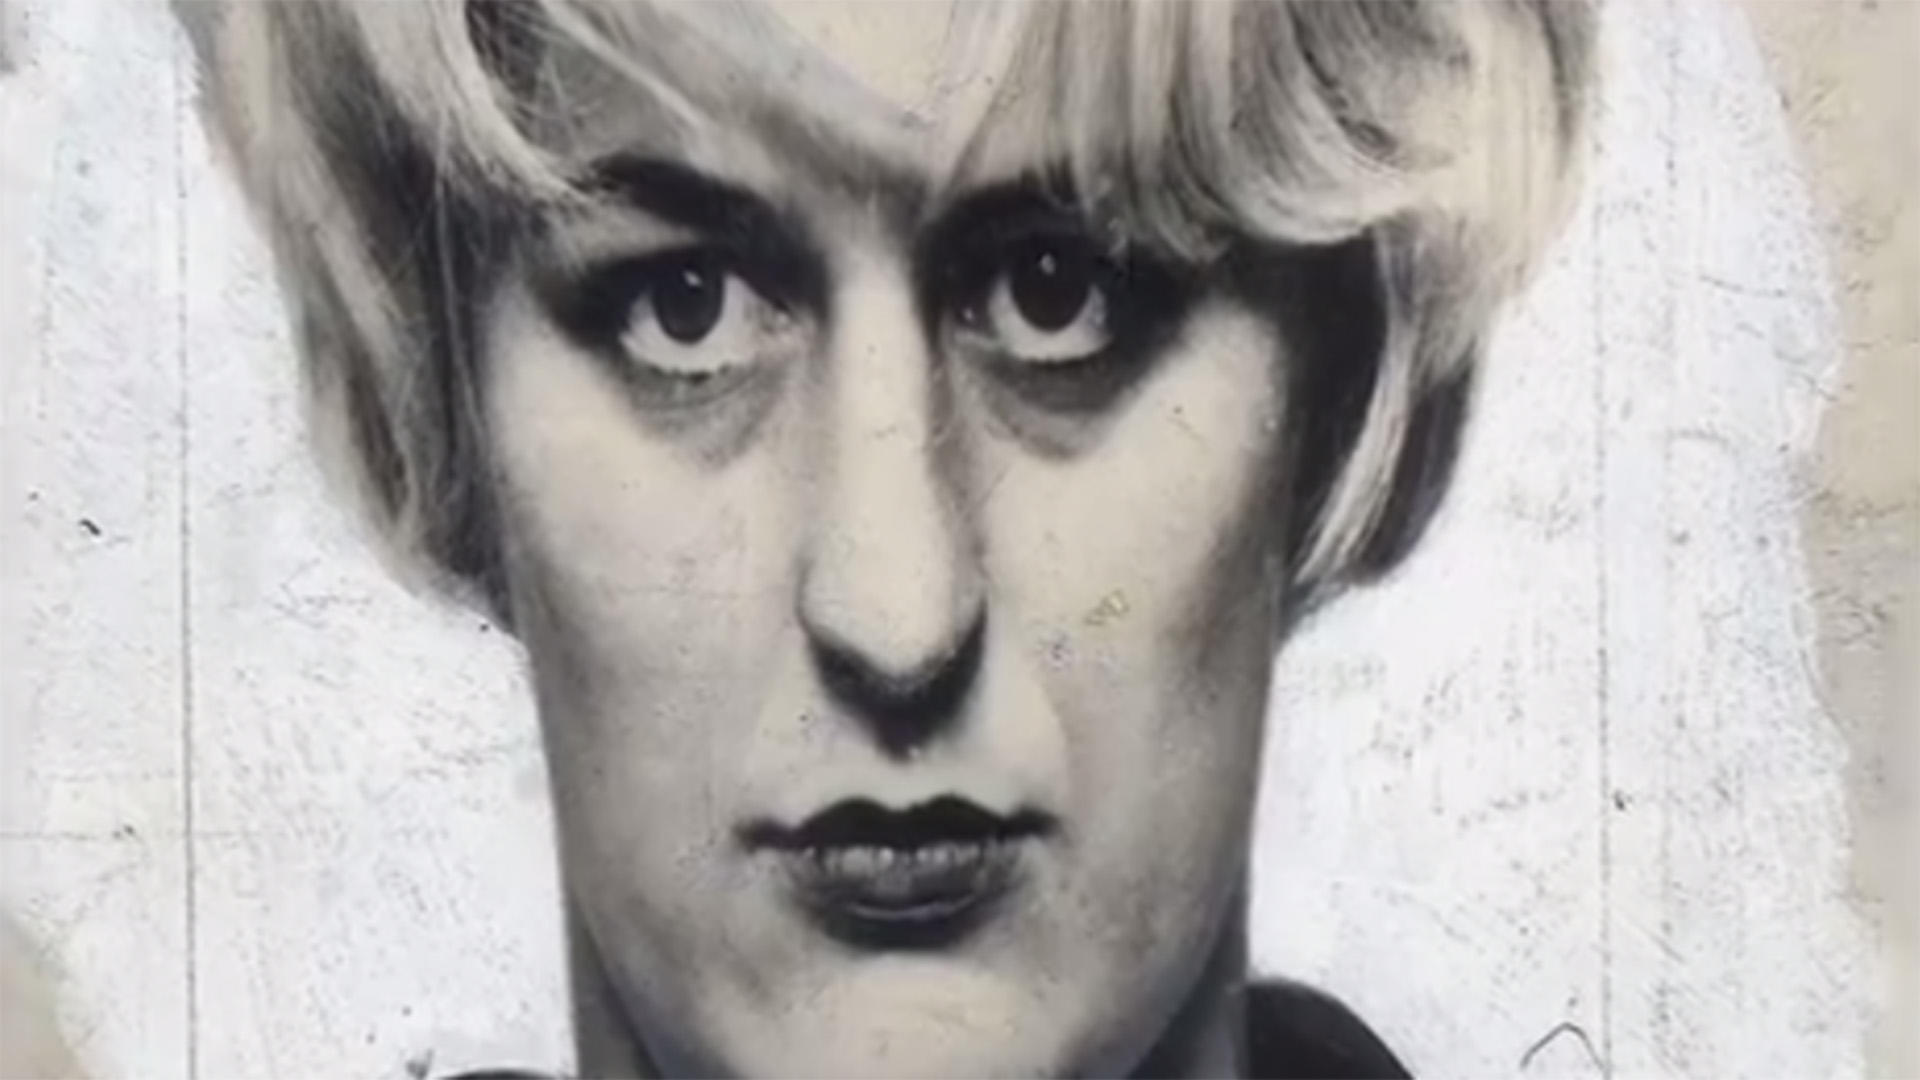 Myra Hindley - Serienkillerin aus Liebe?